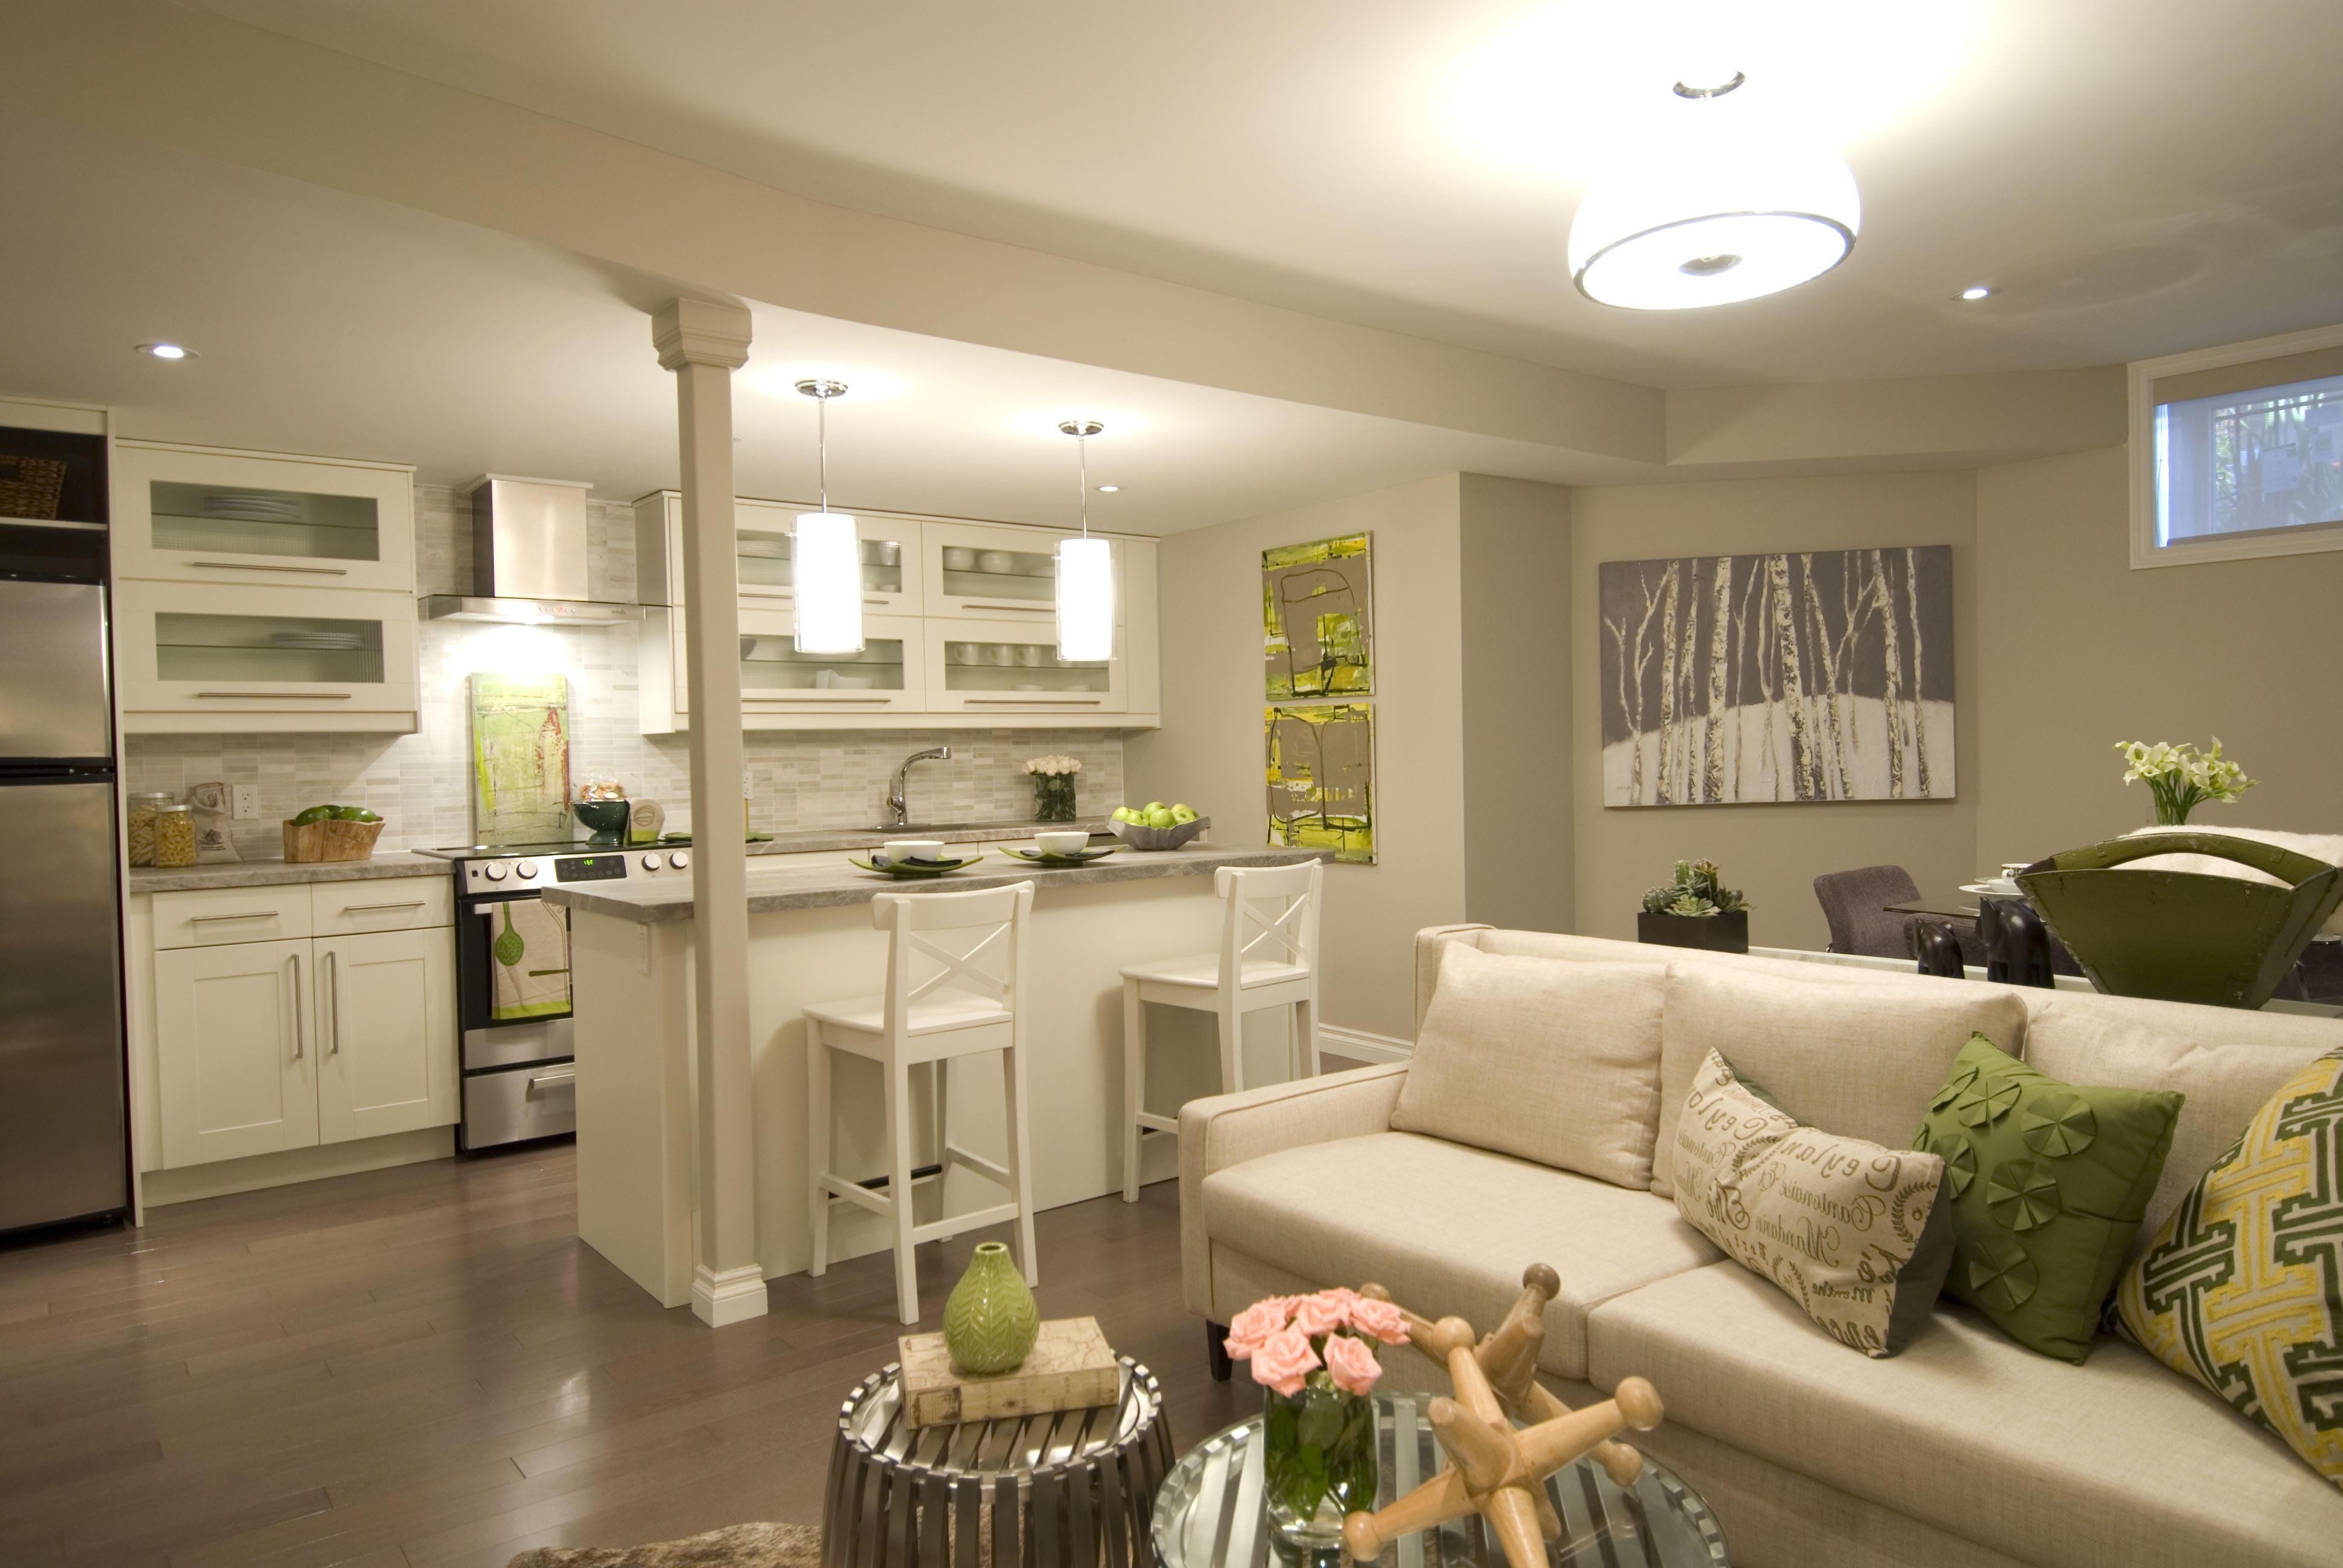 kitchens living rooms combined kitchen living room combo design RNRRVCJ